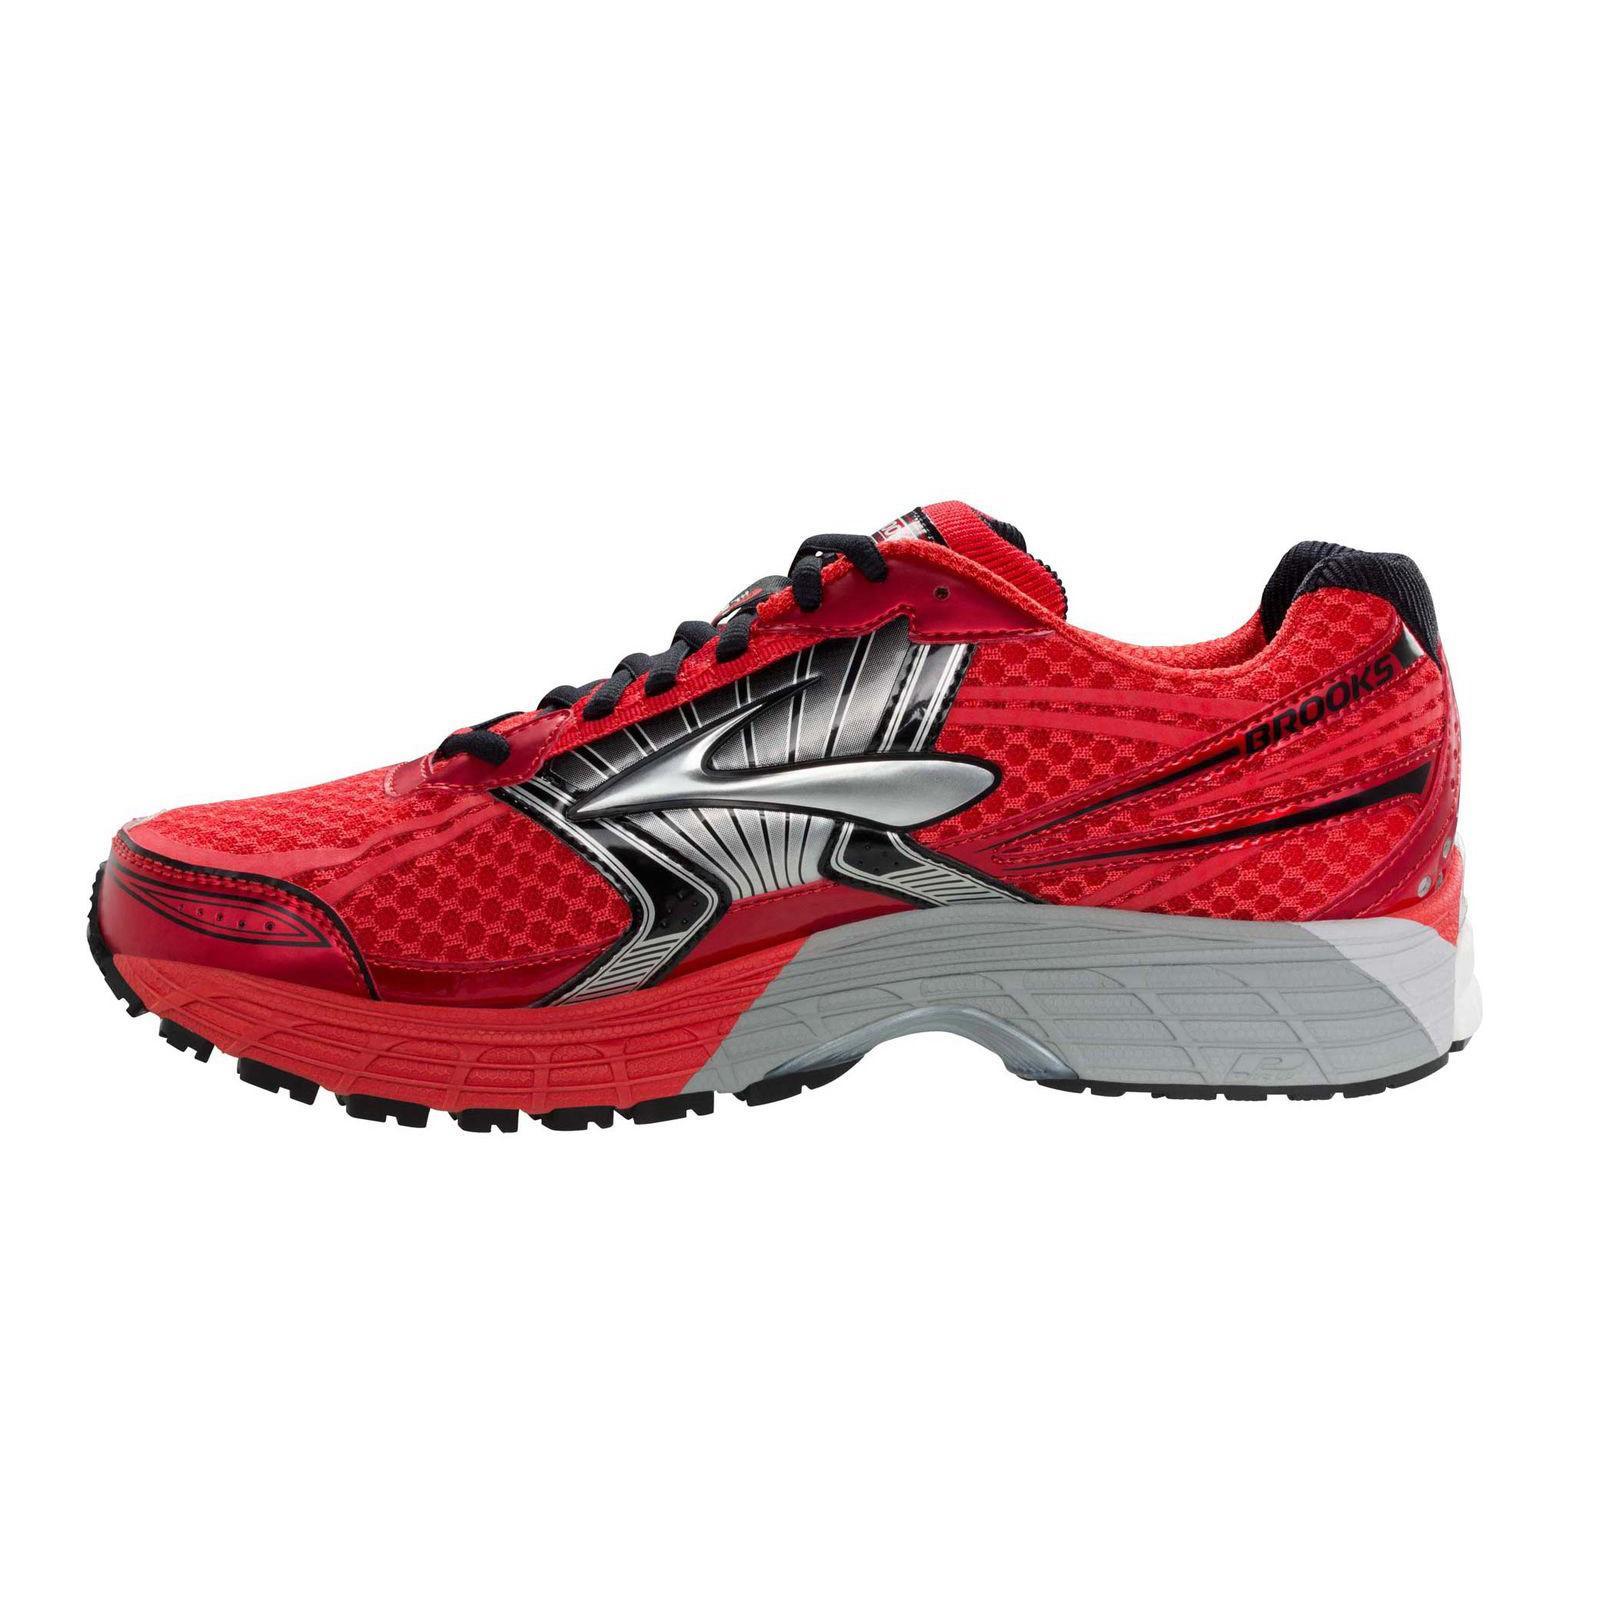 df37e1883eb Brooks Mens Adrenaline GTS 14 Running Shoes - Red - Tennisnuts.com